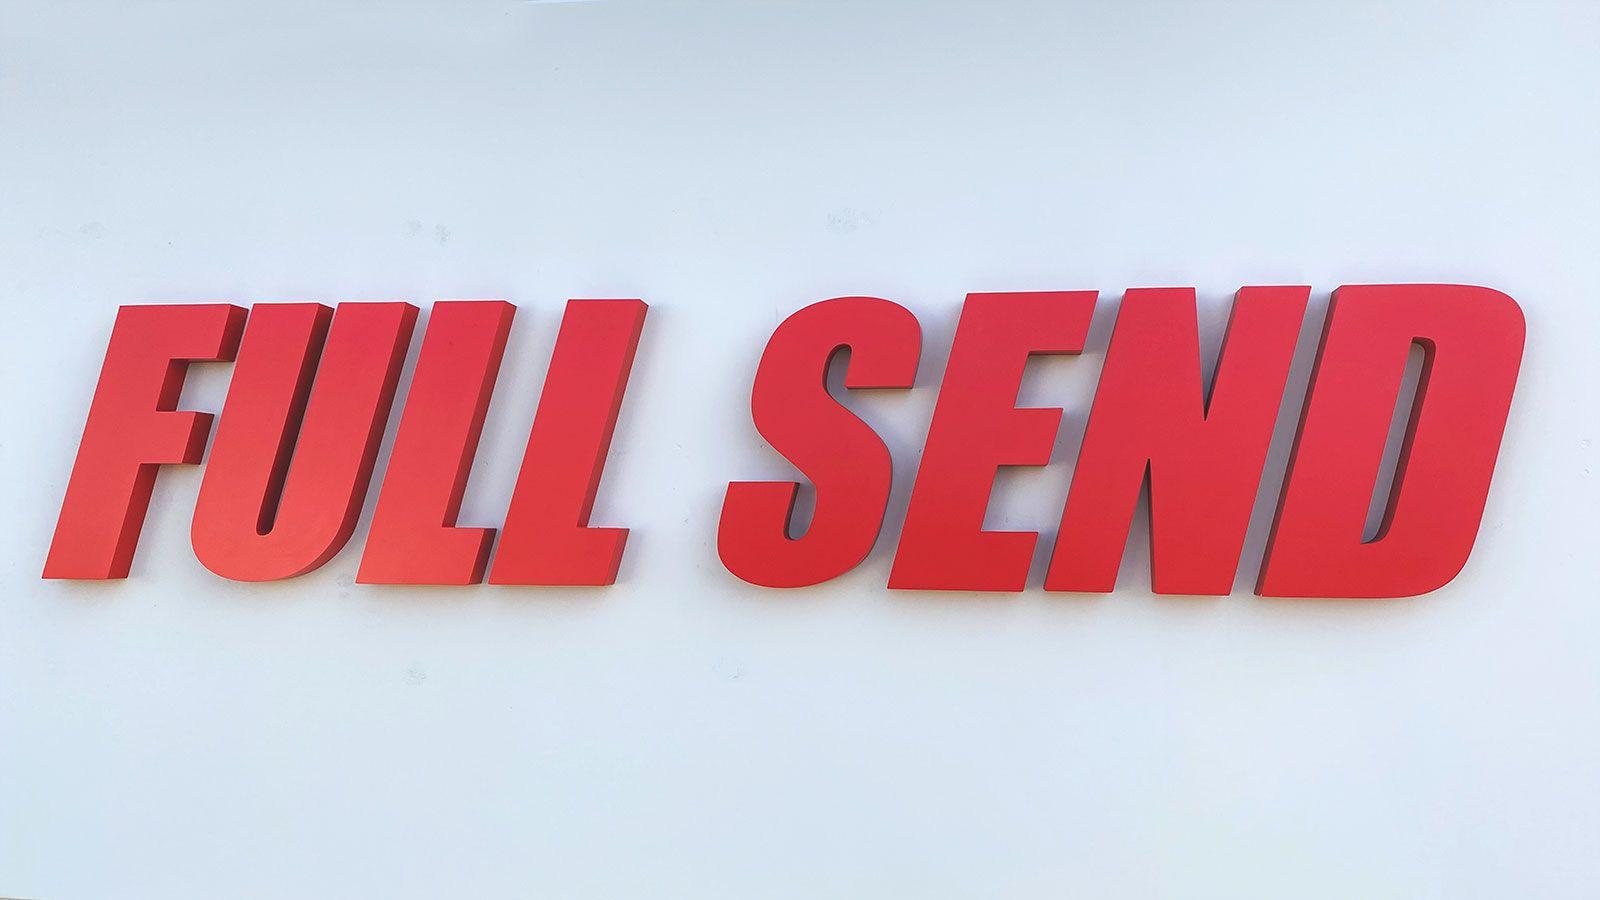 Full Send building sign